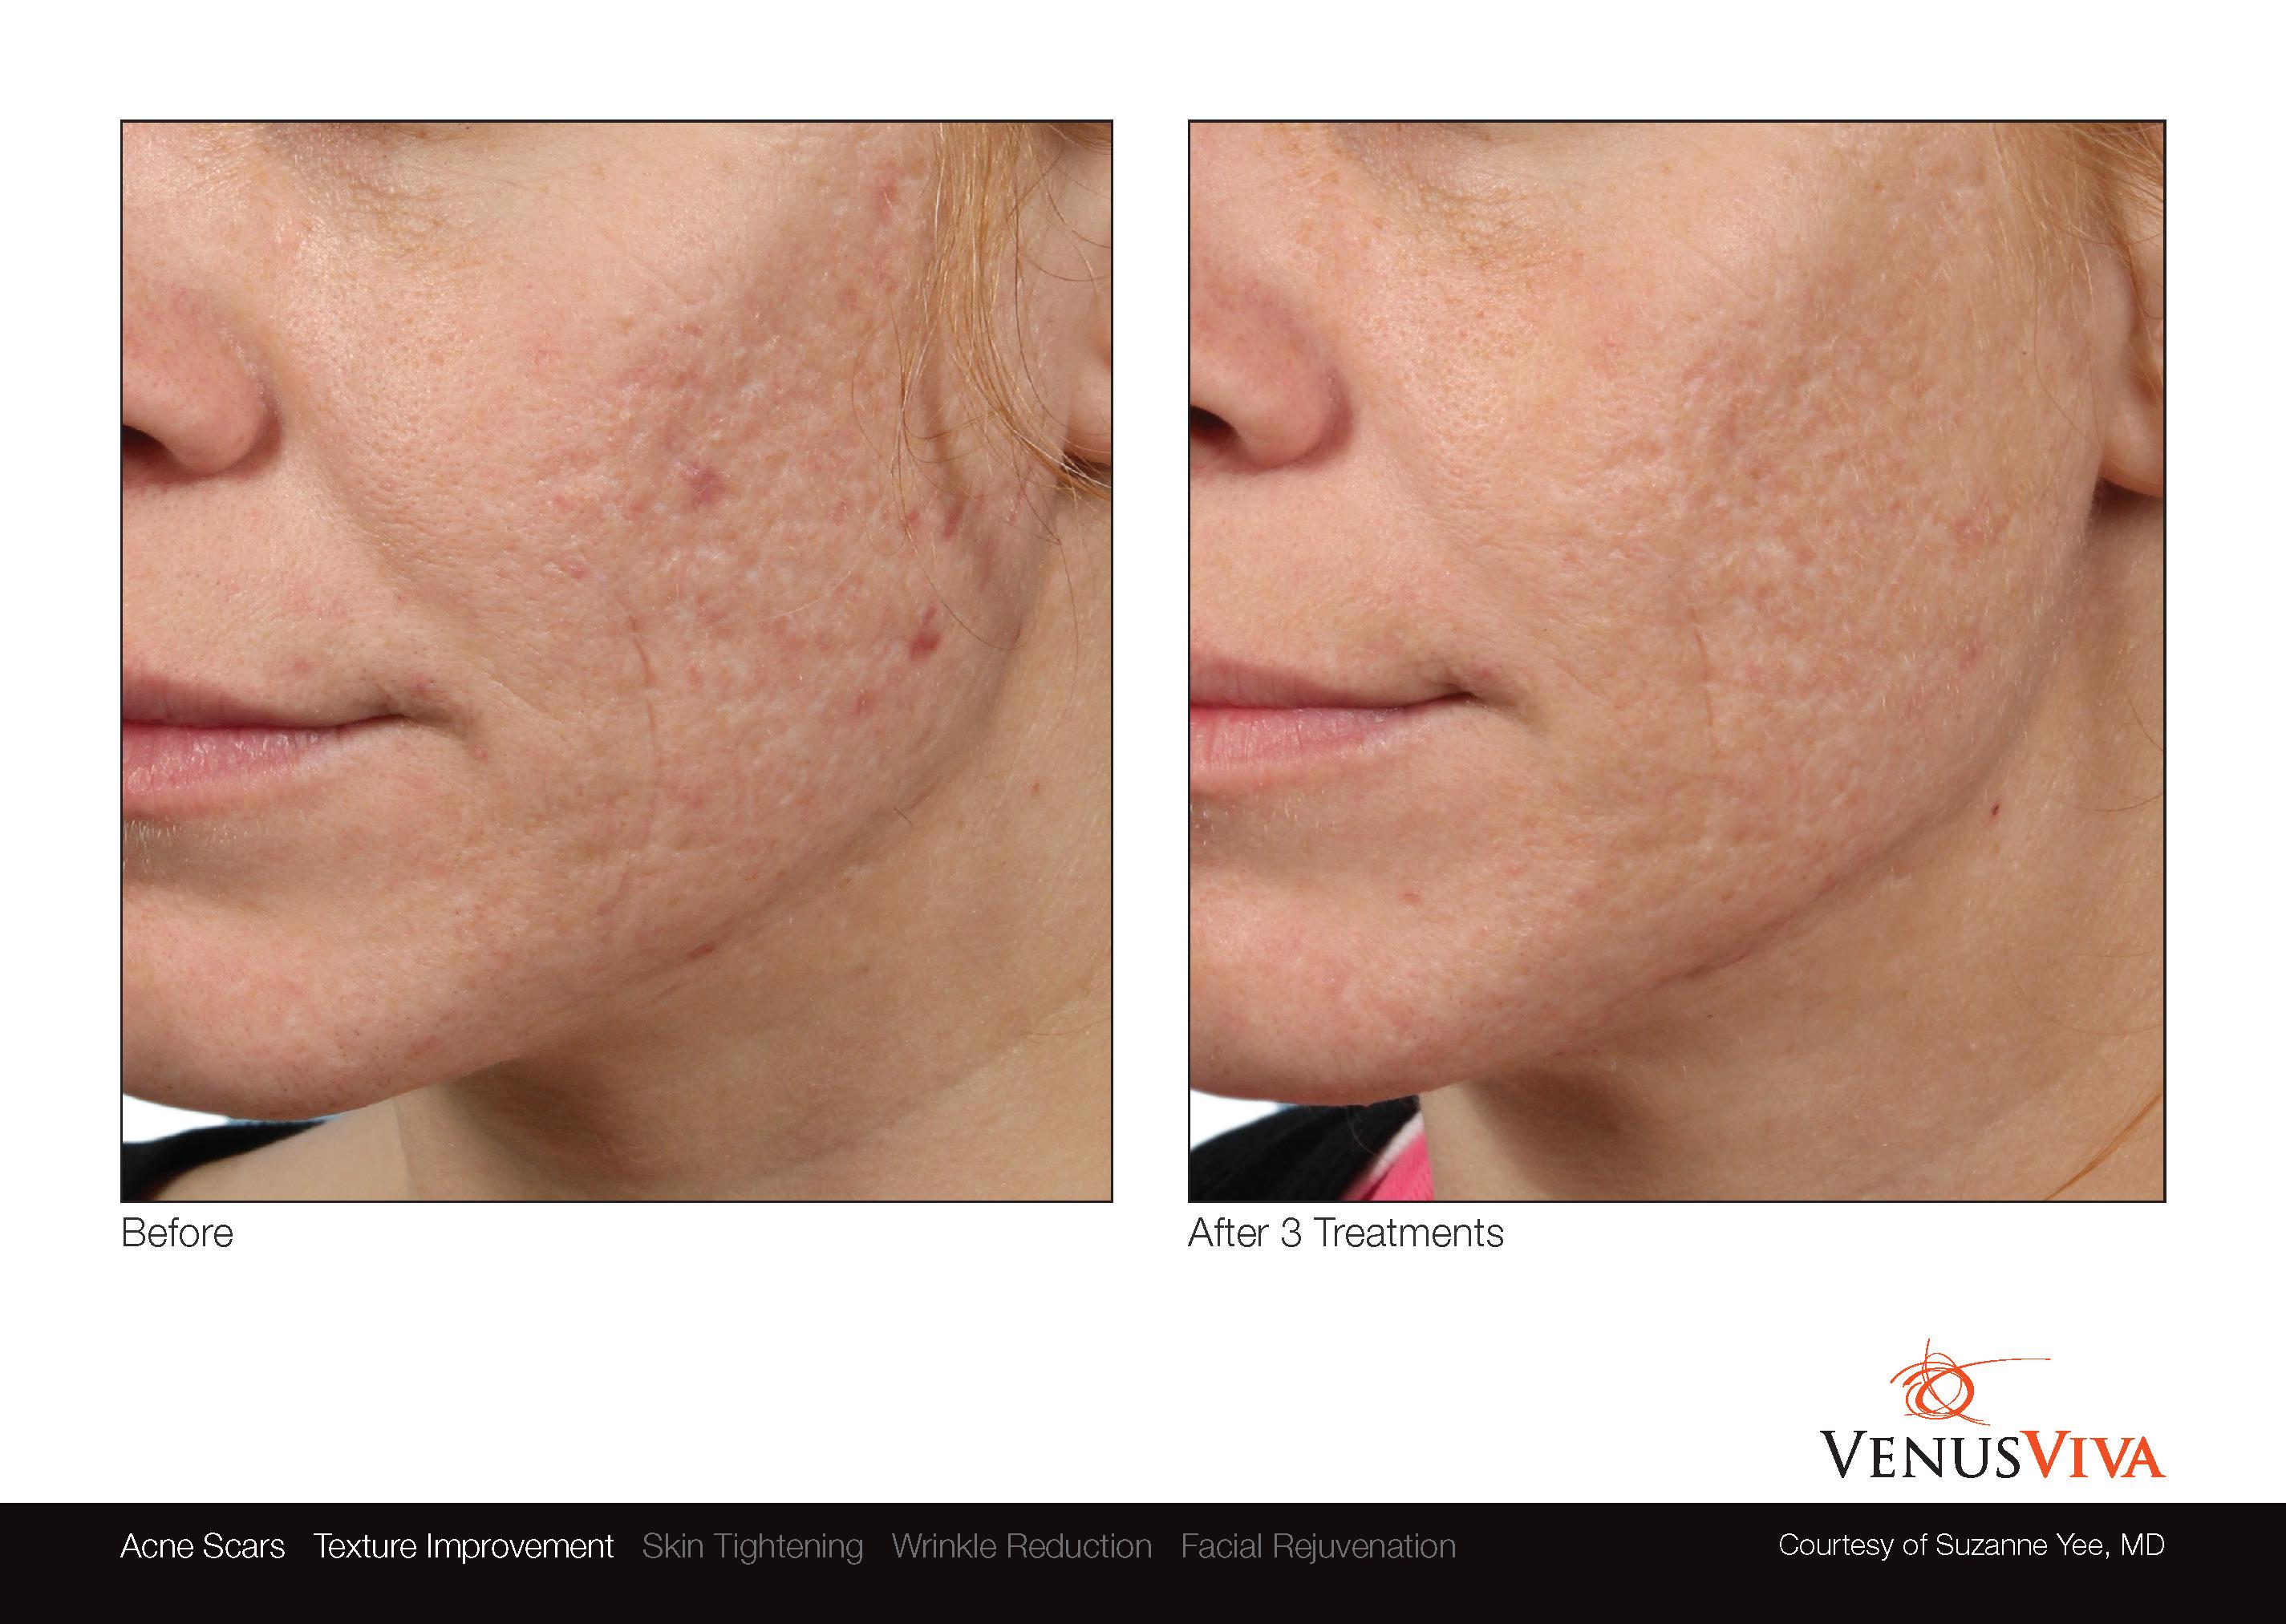 VenusViva_skin resurfacing_acne scars